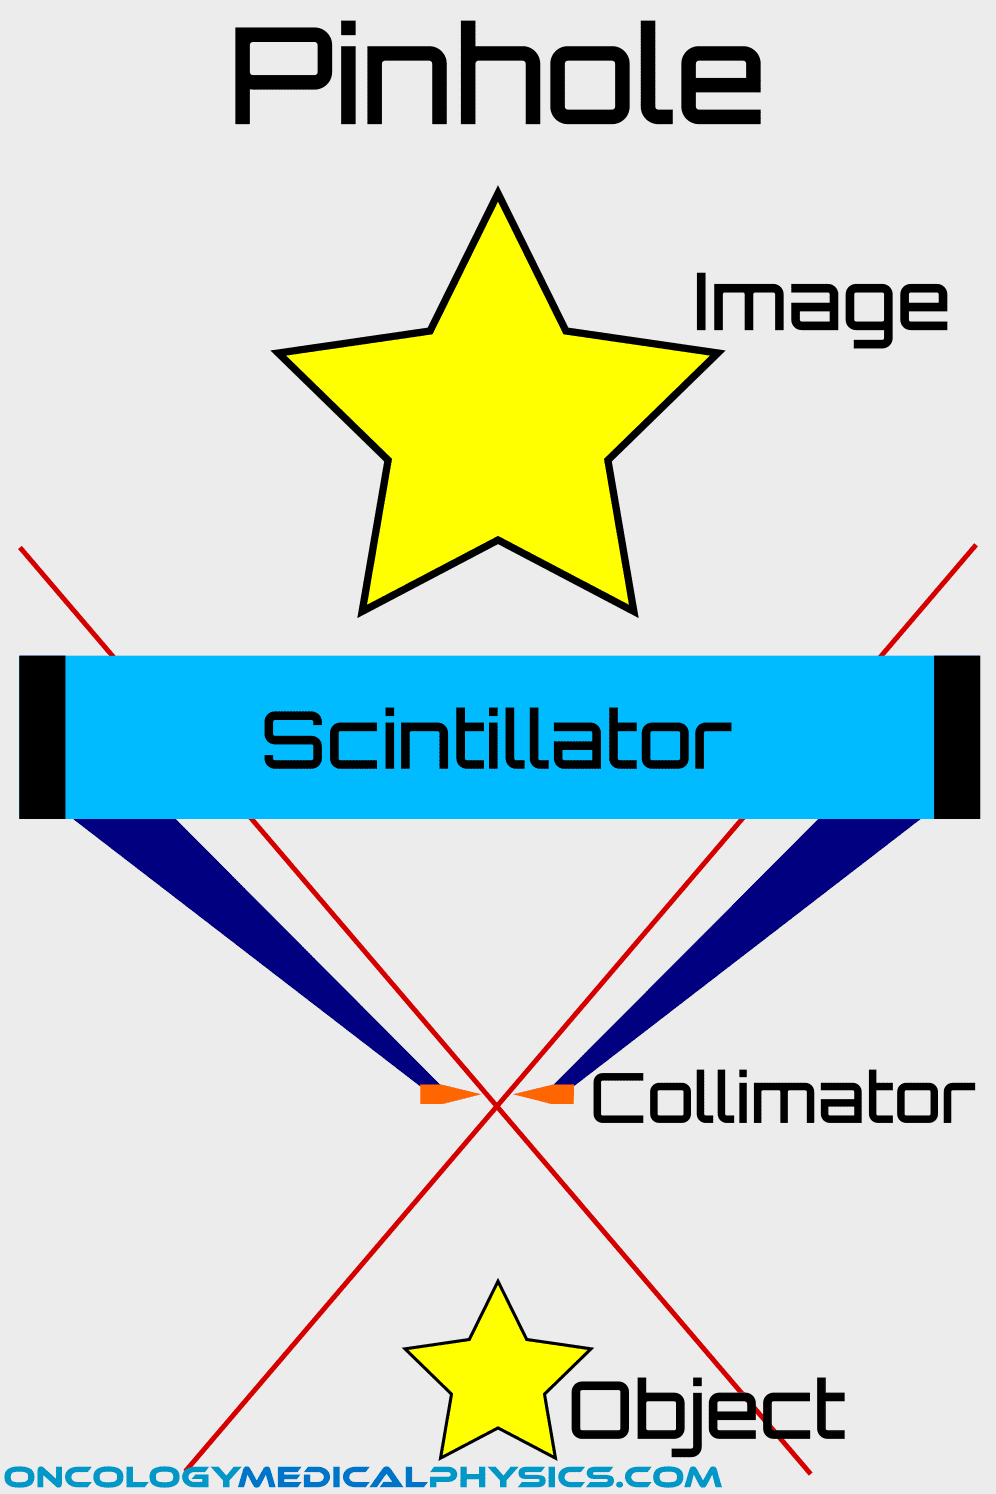 Pinhole collimator used on gamma scintillation nuclear camera